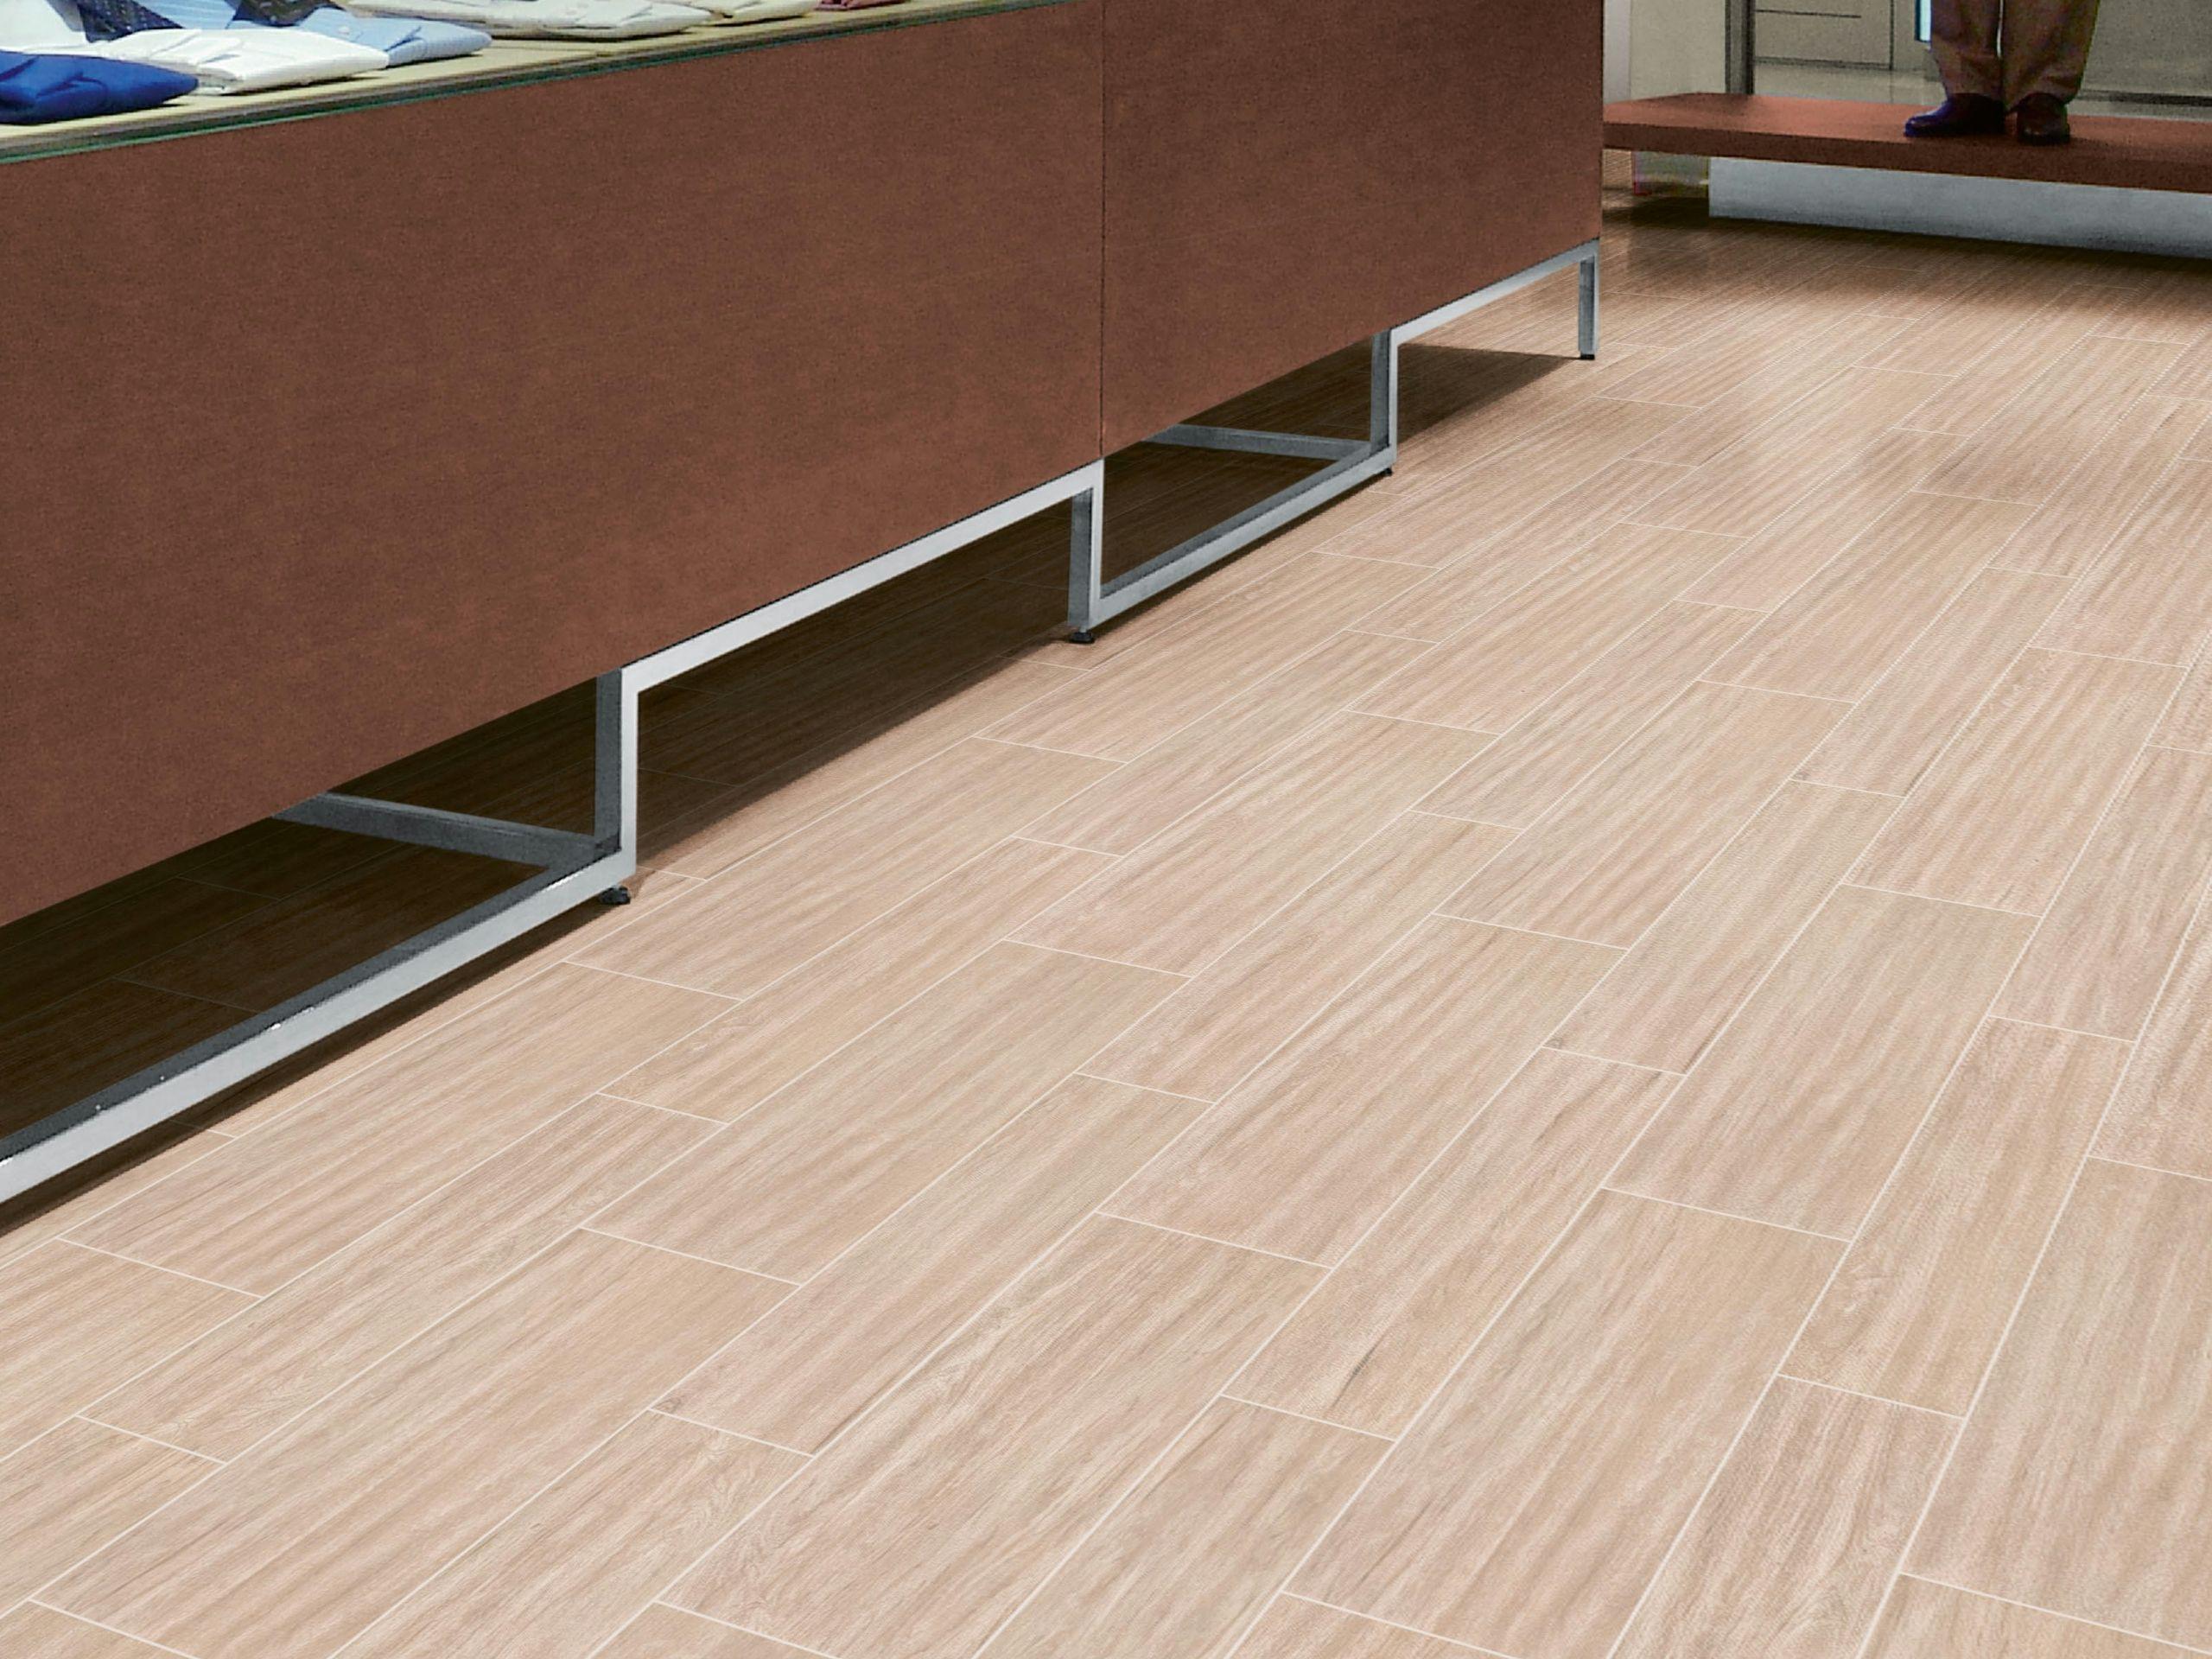 Pavimento de gres porcel nico imitaci n madera nairobi by for Pavimento imitacion madera